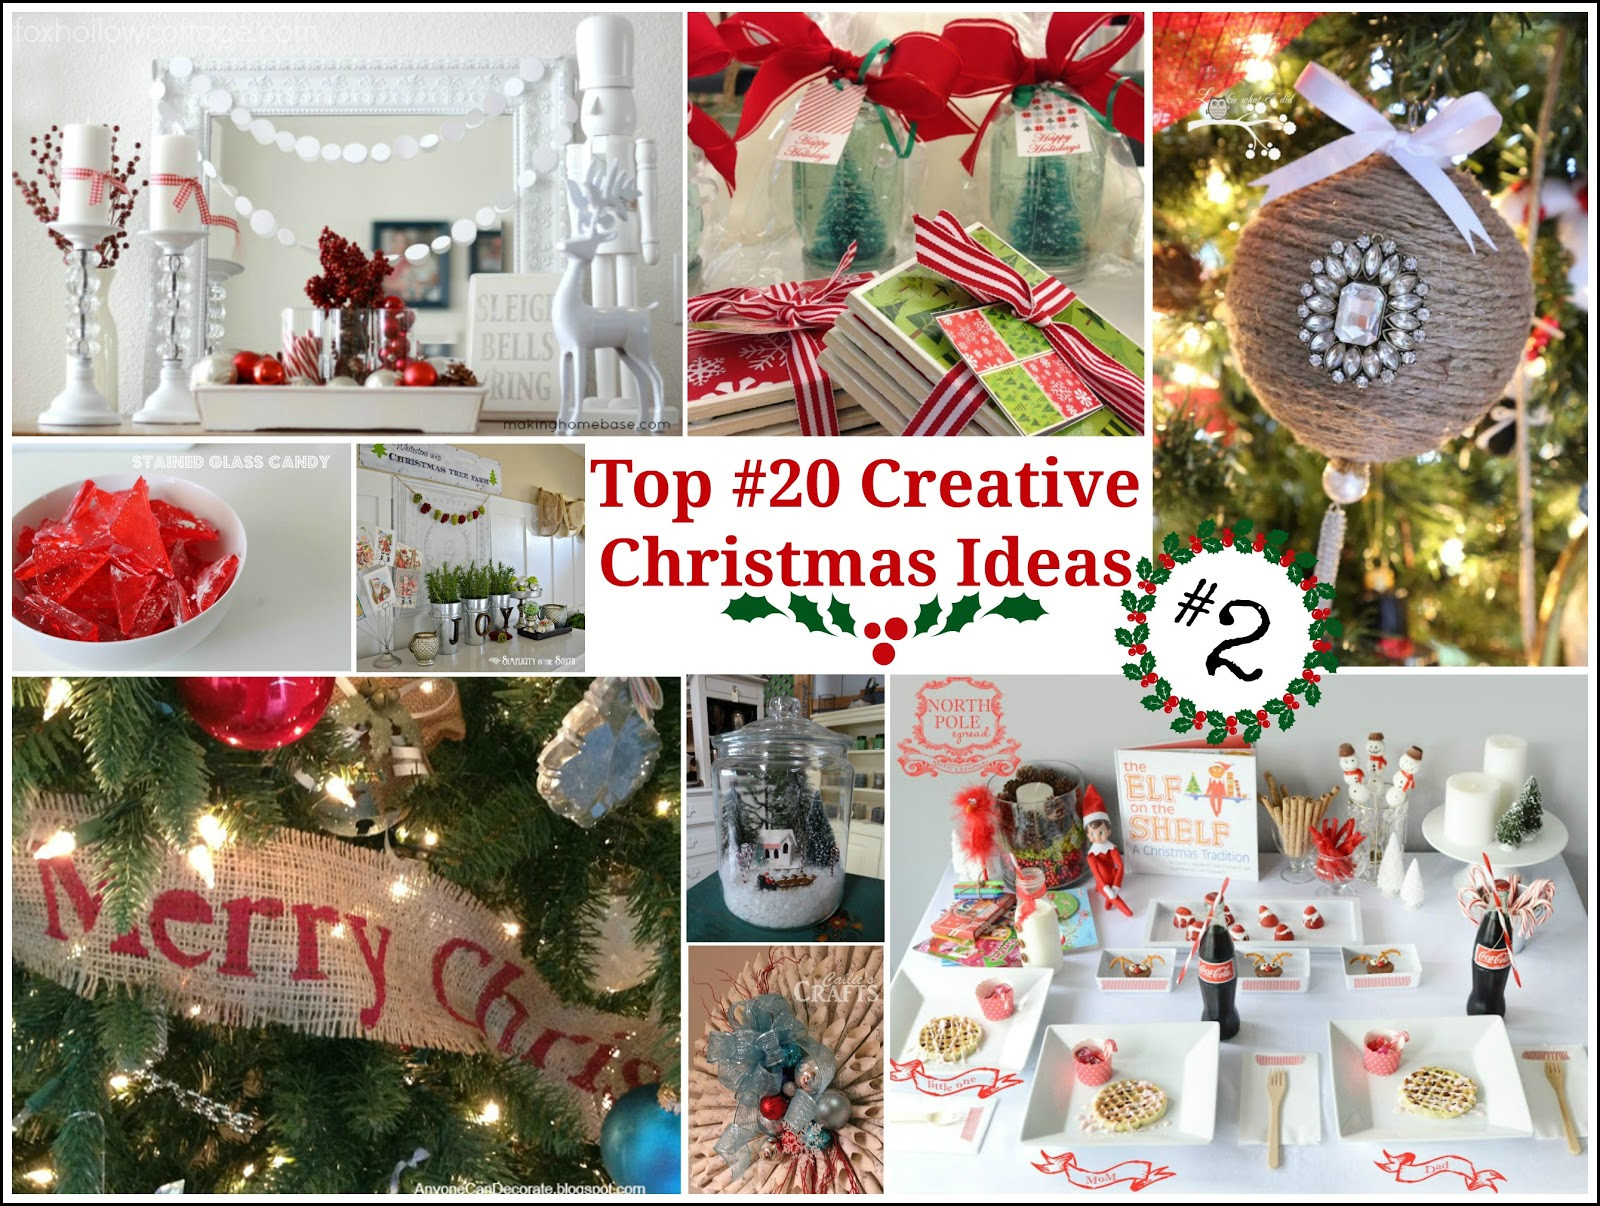 Creative Holiday Party Ideas  Top 20 Creative Christmas Ideas II Fox Hollow Cottage